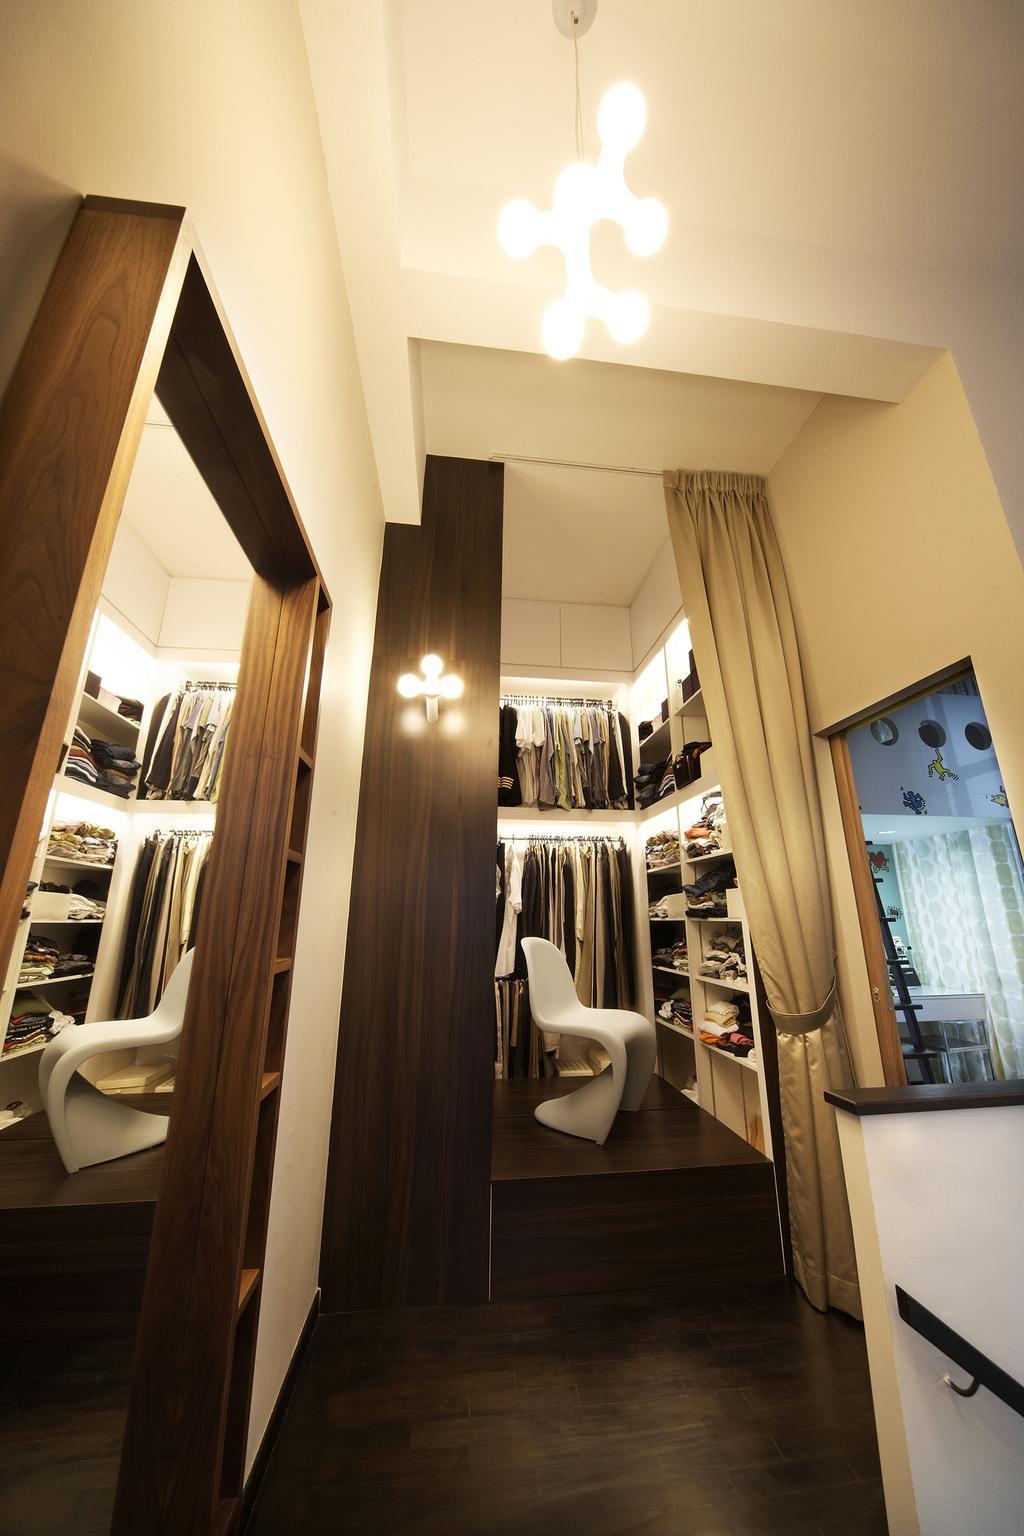 Eclectic, Condo, Study, Zedge, Interior Designer, Free Space Intent, Closet, Walk In Wardrobe, Wardrobe, Hanging Light, Bathroom, Indoors, Interior Design, Room, Furniture